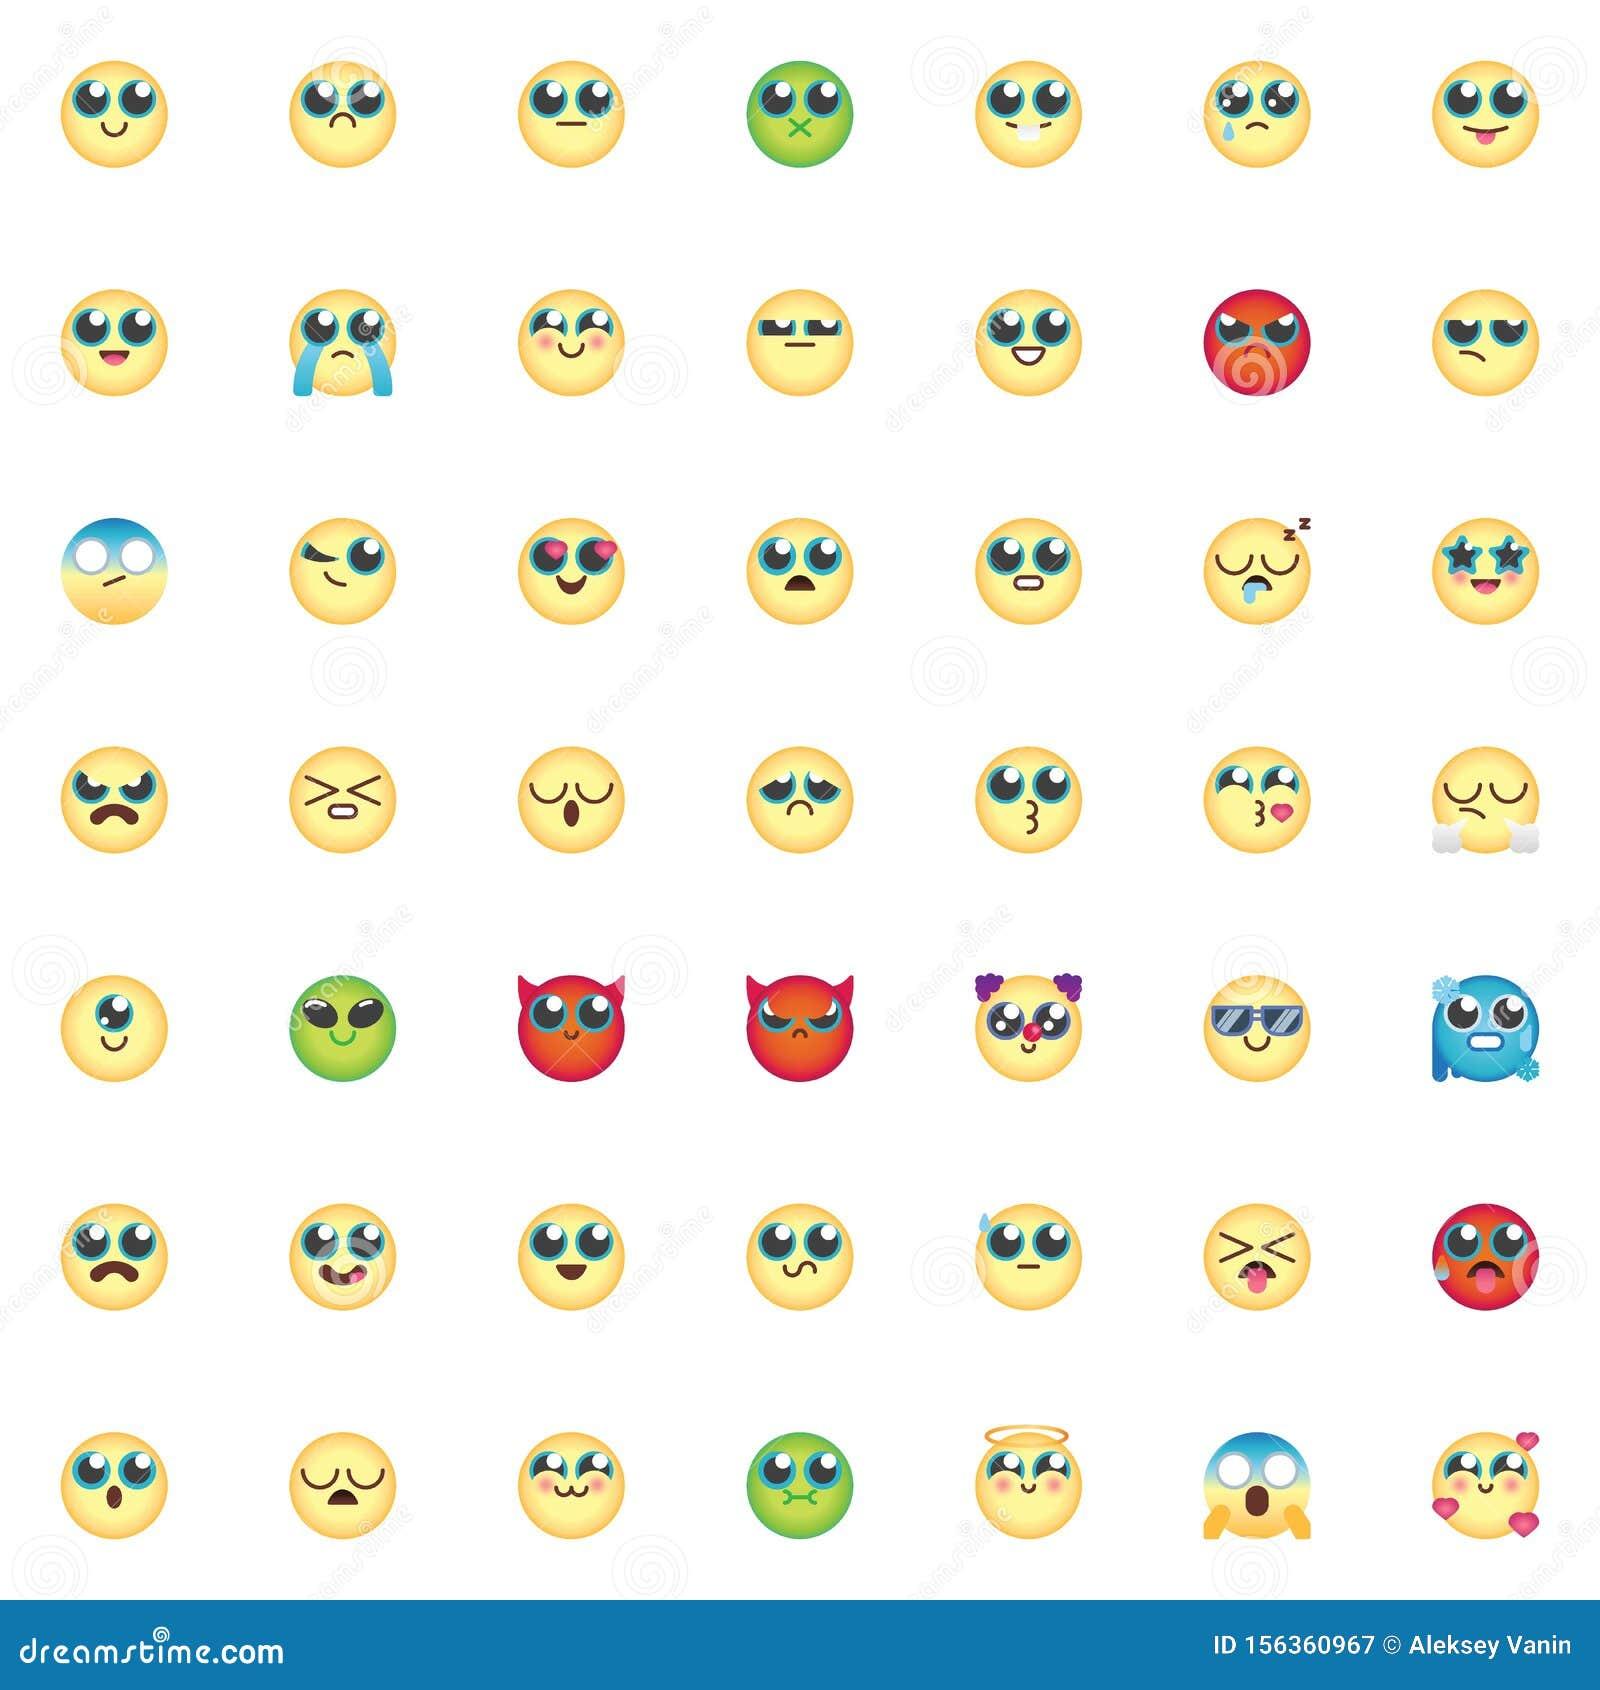 Emoticon elements collection, Comic Emoji smiley flat icons set